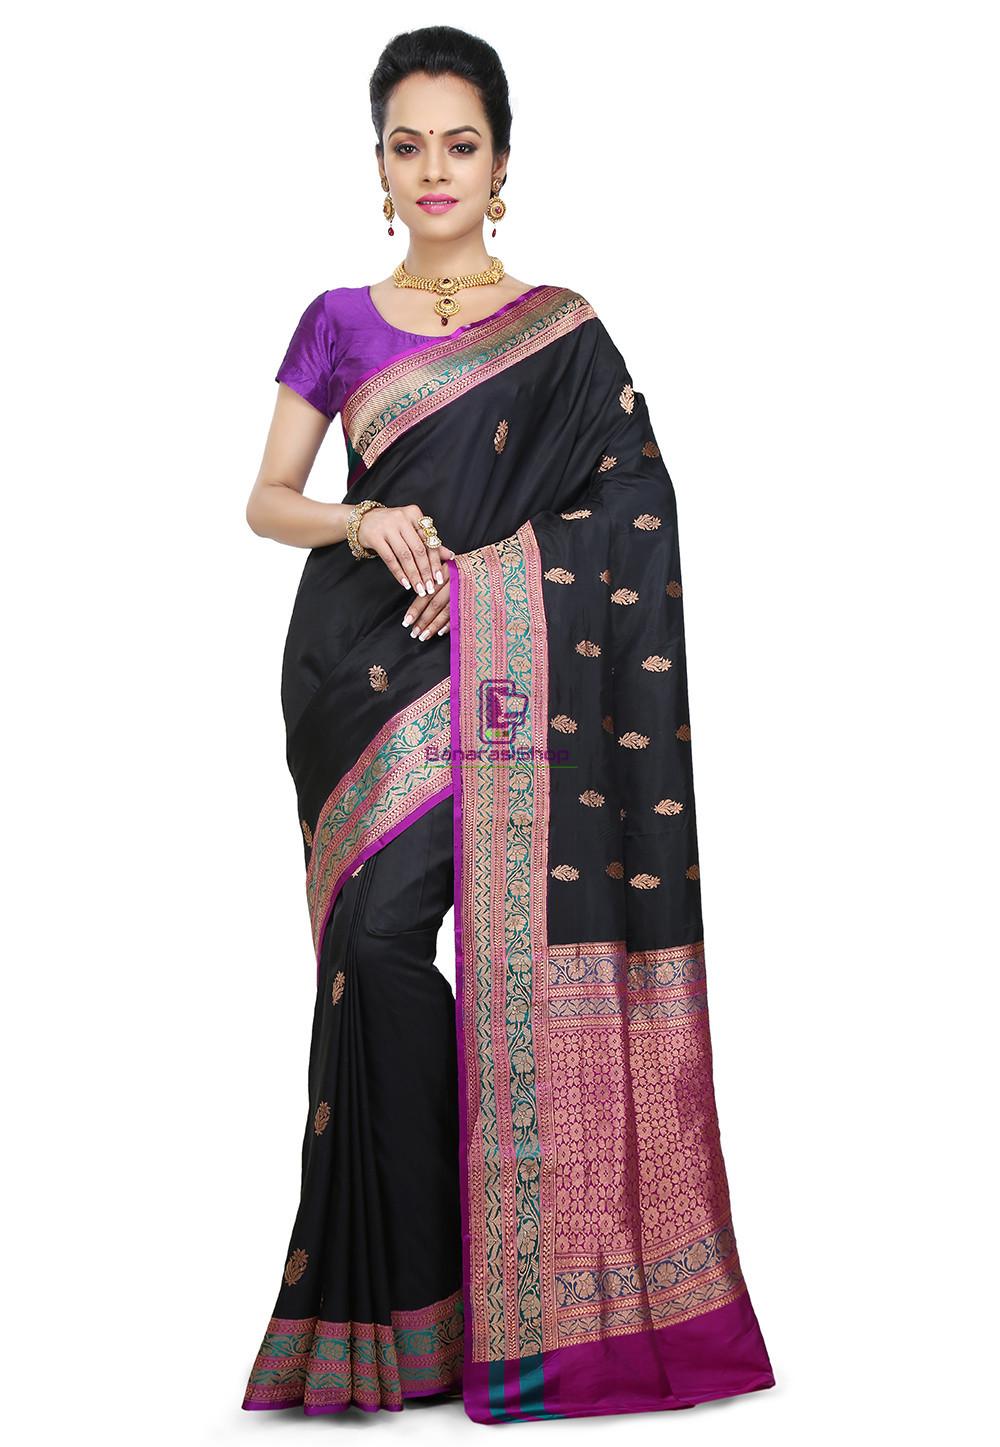 Banarasi Pure Katan Silk Handloom Saree in Black 1